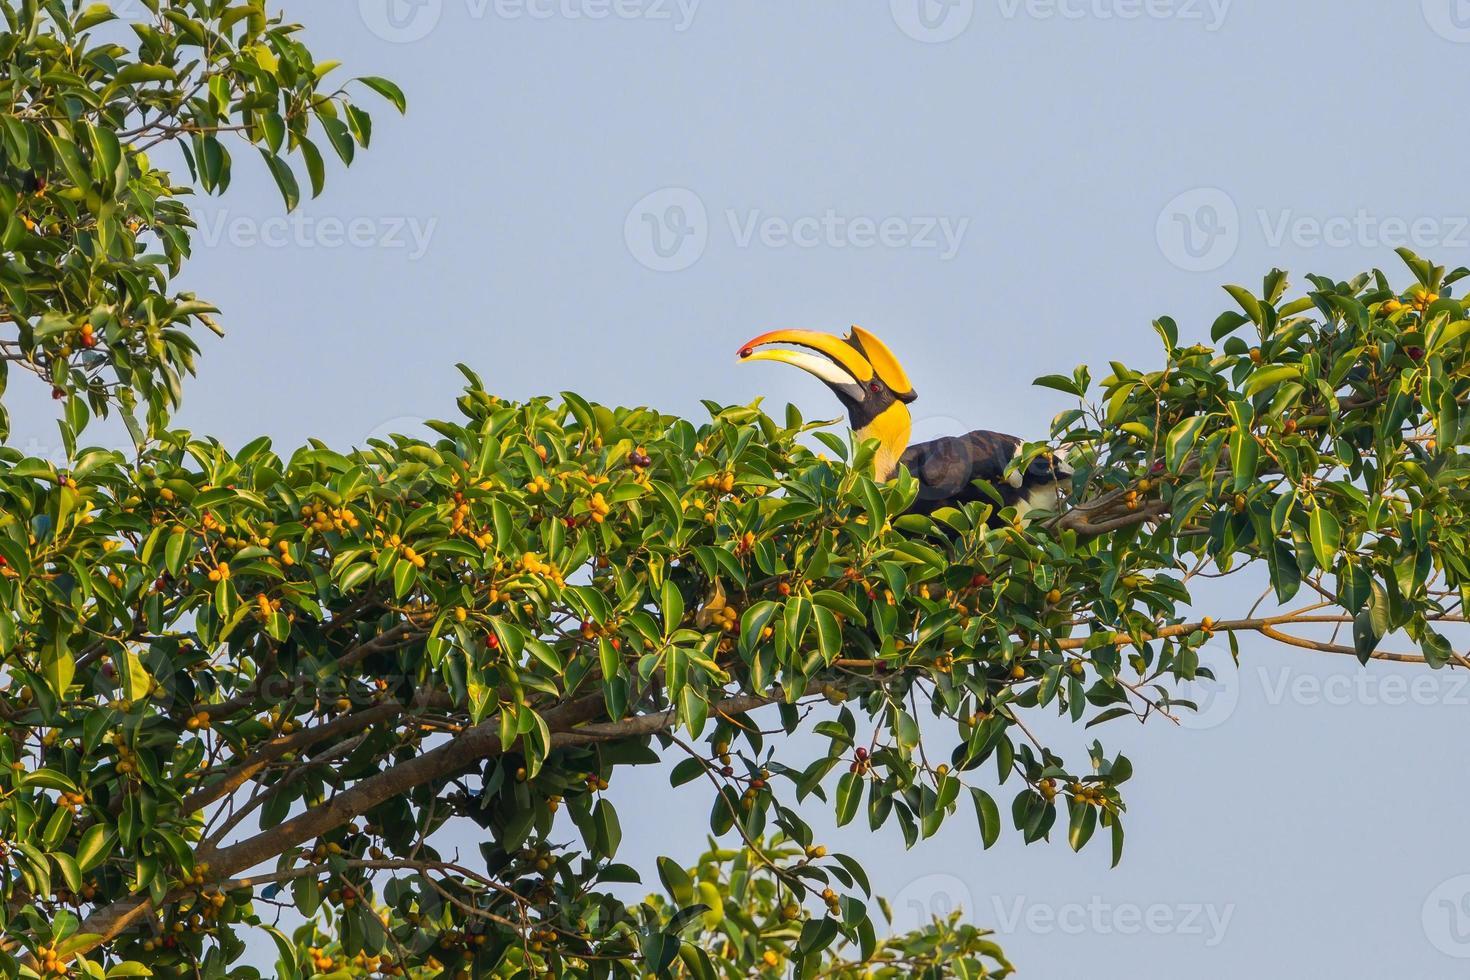 Calau-de-bico-grande (buceros bicornis) foto